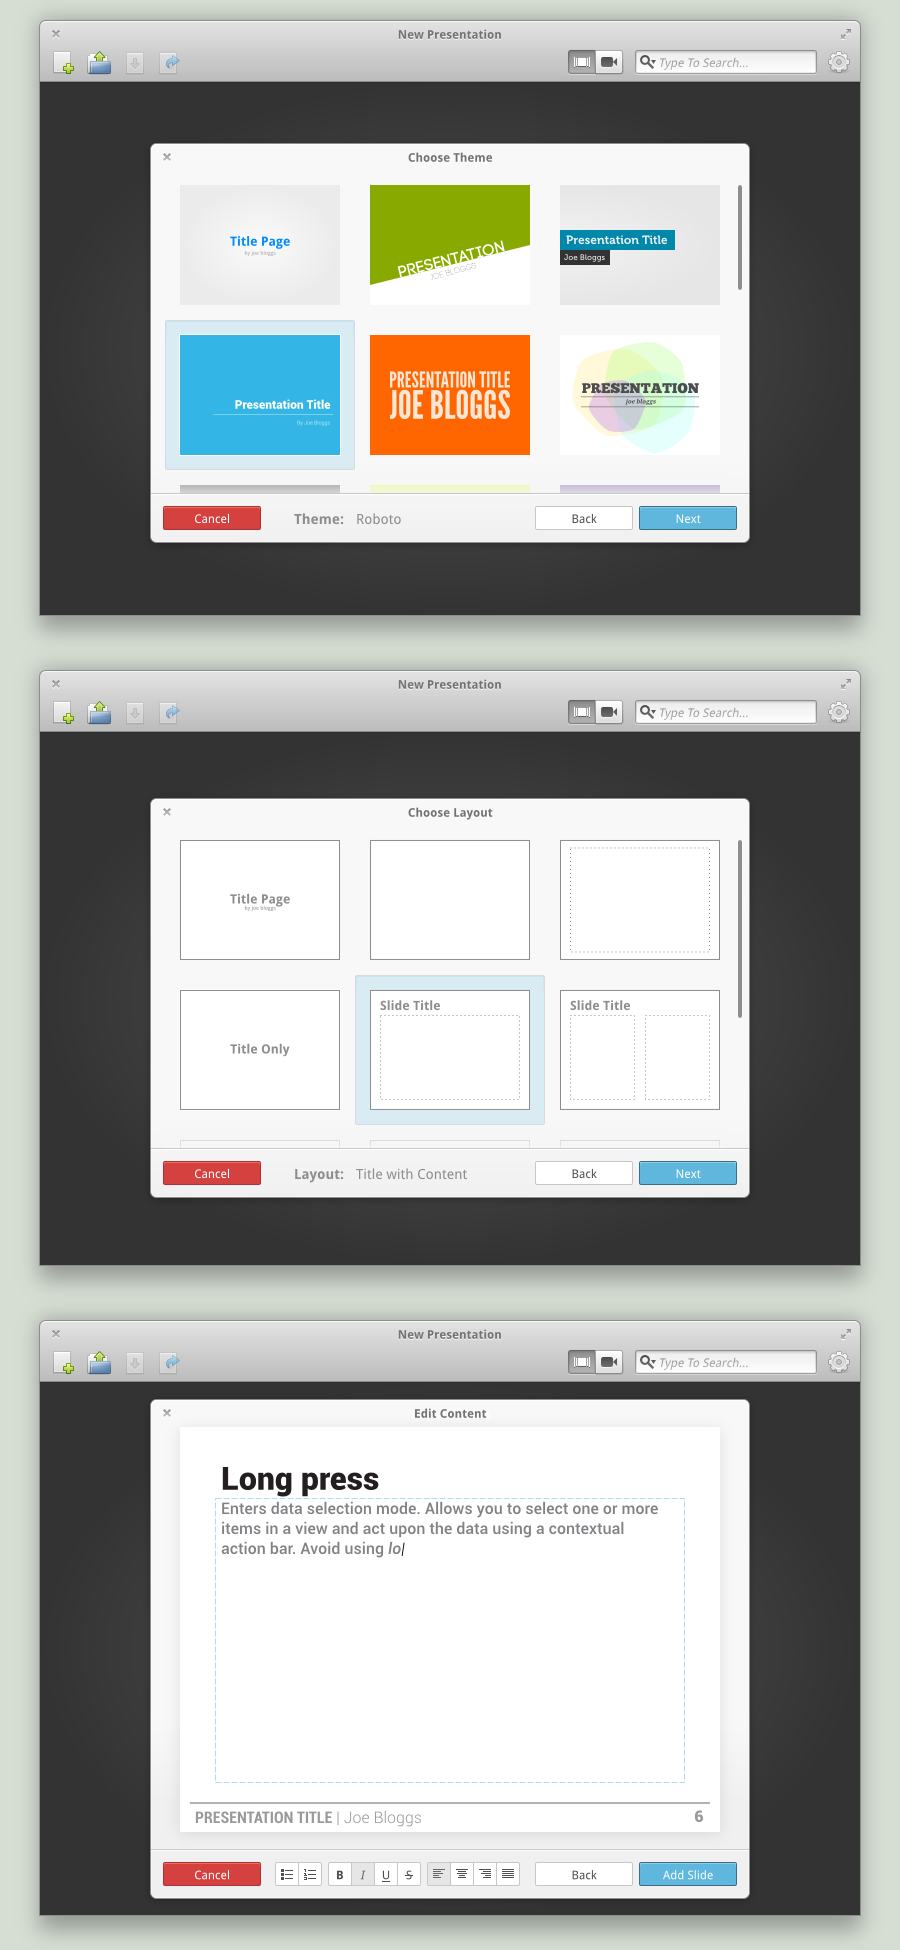 Presentation Concept Slide Editor by spiceofdesign